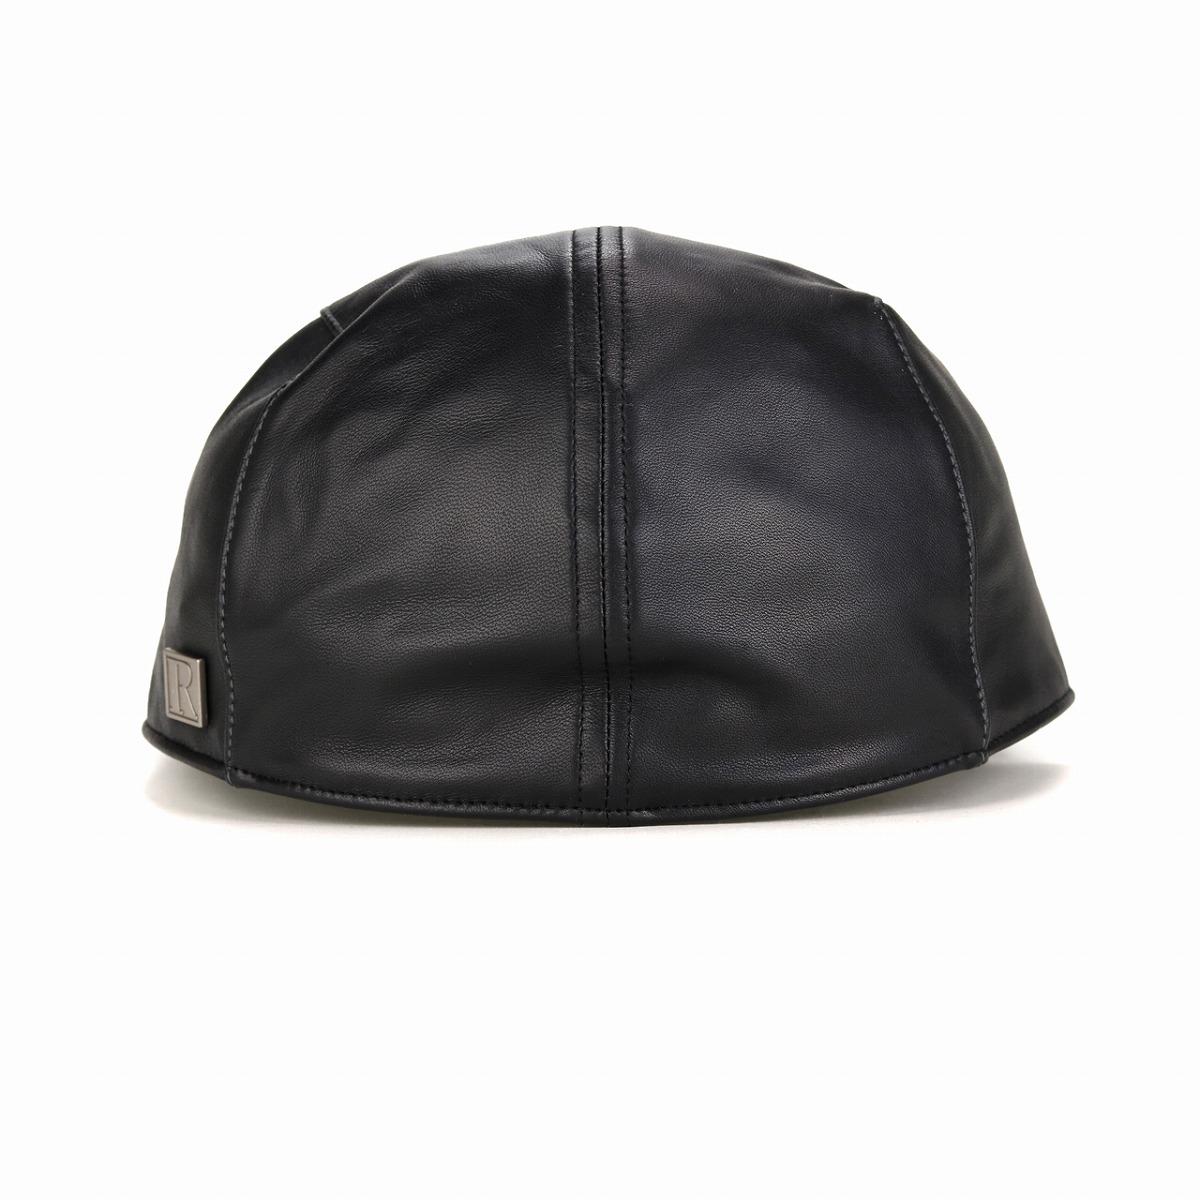 d16b25d79 Leather hunting cap hat men sheep leather hunting cap hat ブランドレガリス NAPPA  LEATHER ナッパレザー REGALIS men / black black